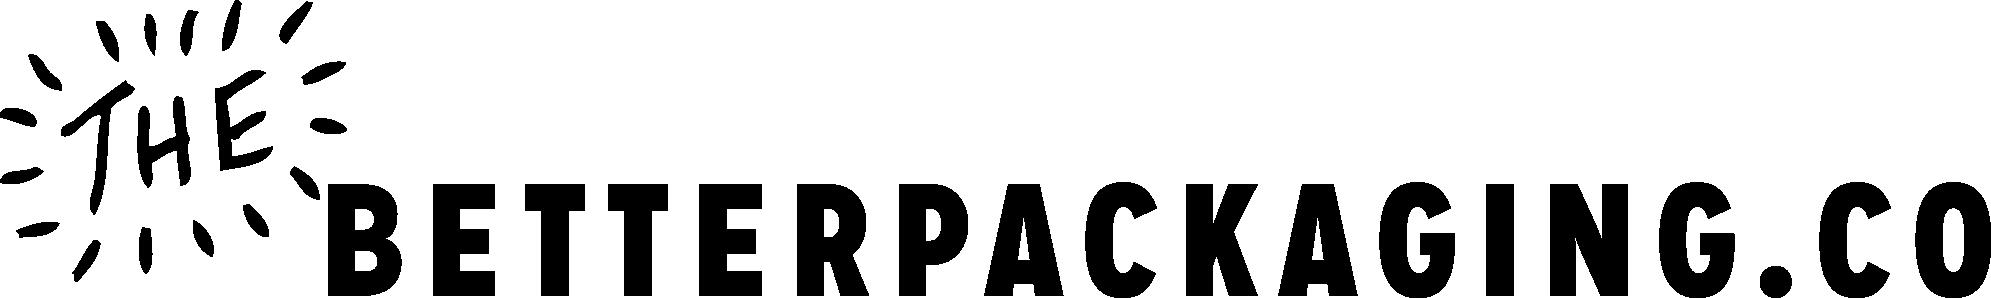 TBCo-horiz-logo-no-www.png